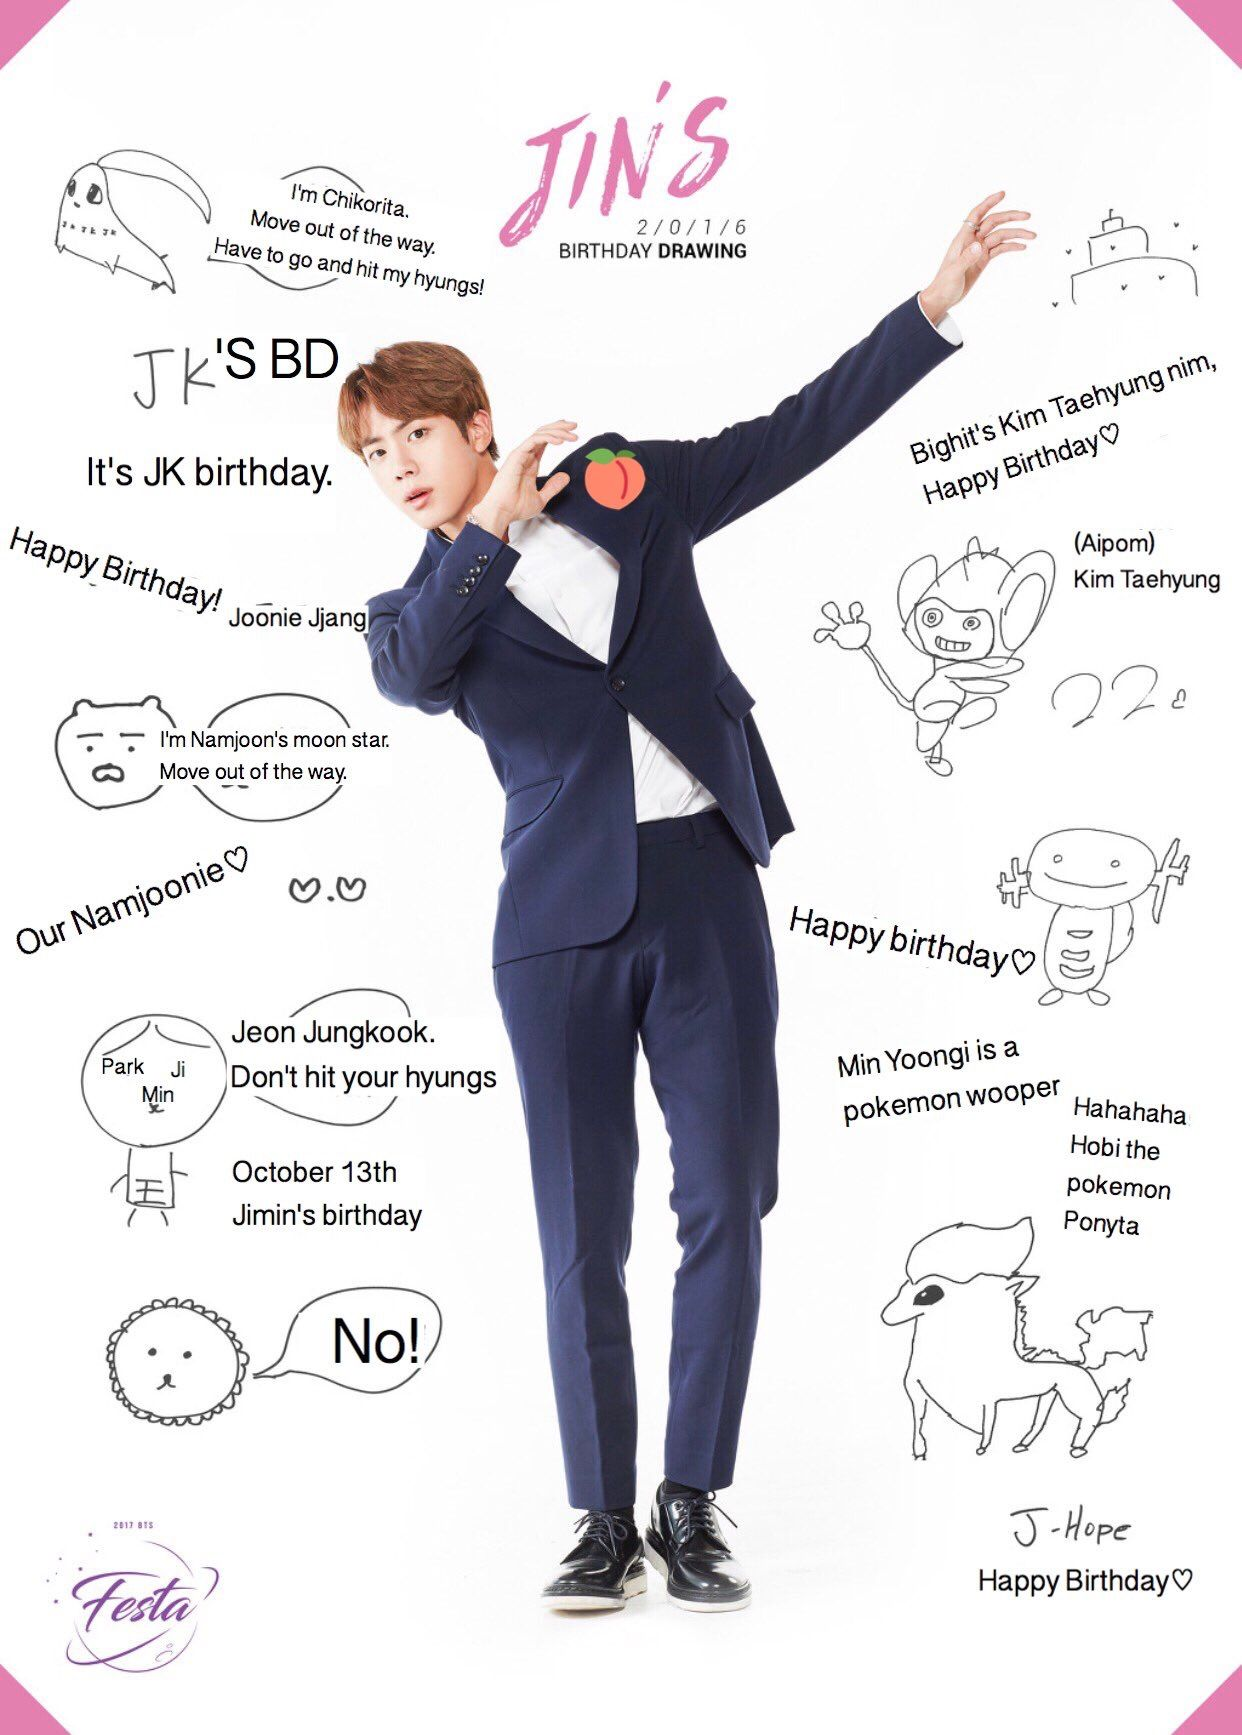 Pin By Tmf Smilingeyes On Jin Bts Jin Bts Birthdays Jin